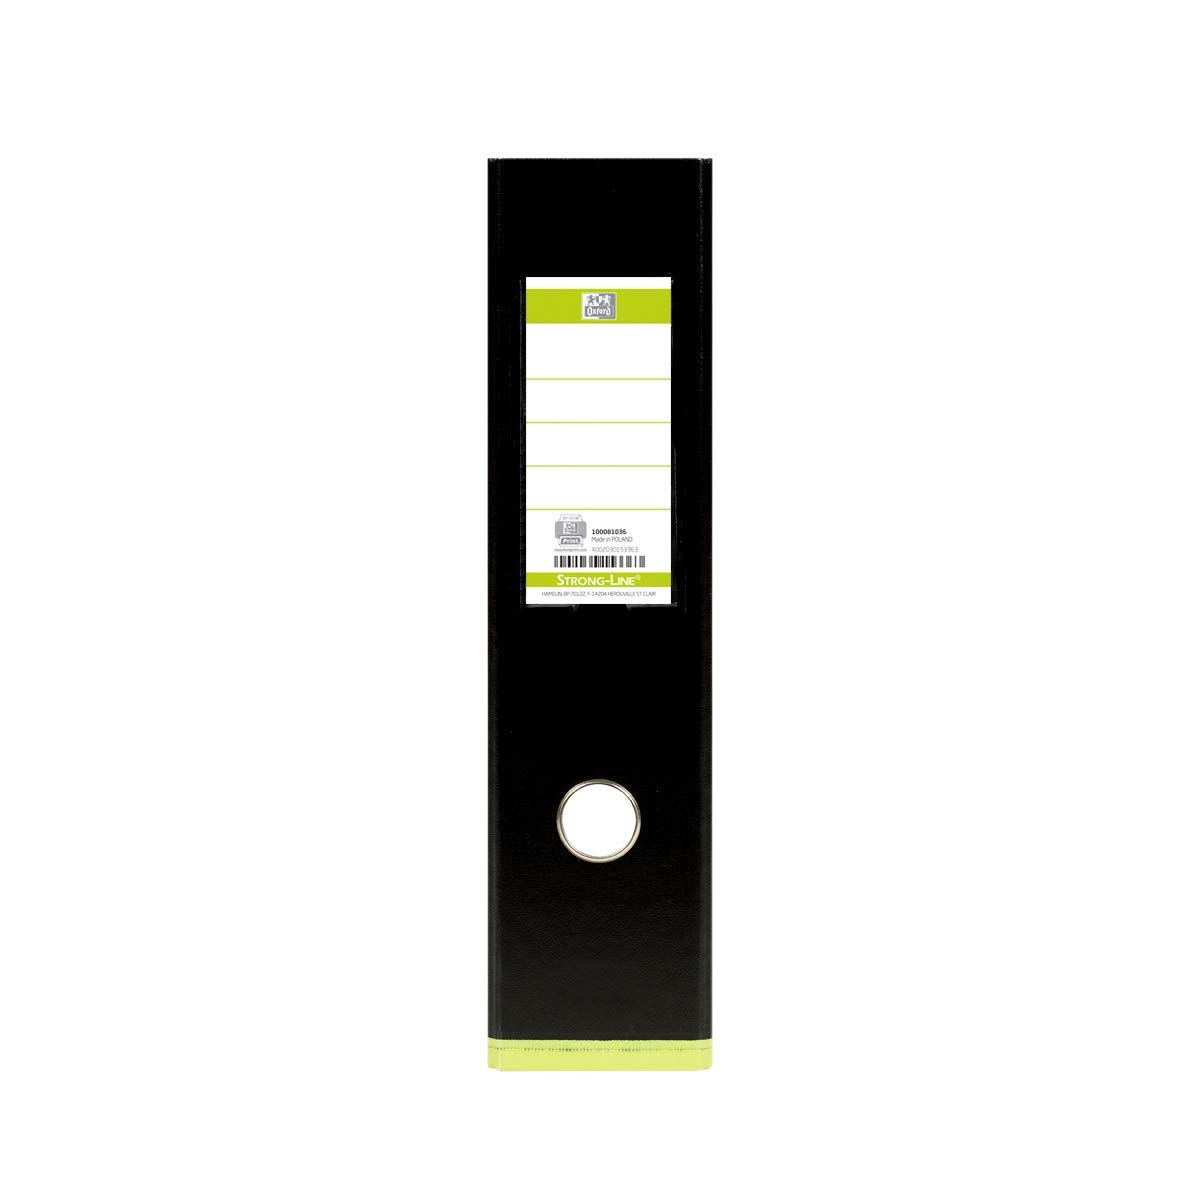 Paisaje A4 Polipropileno Carpeta PP Negro y verde Elba 100081036